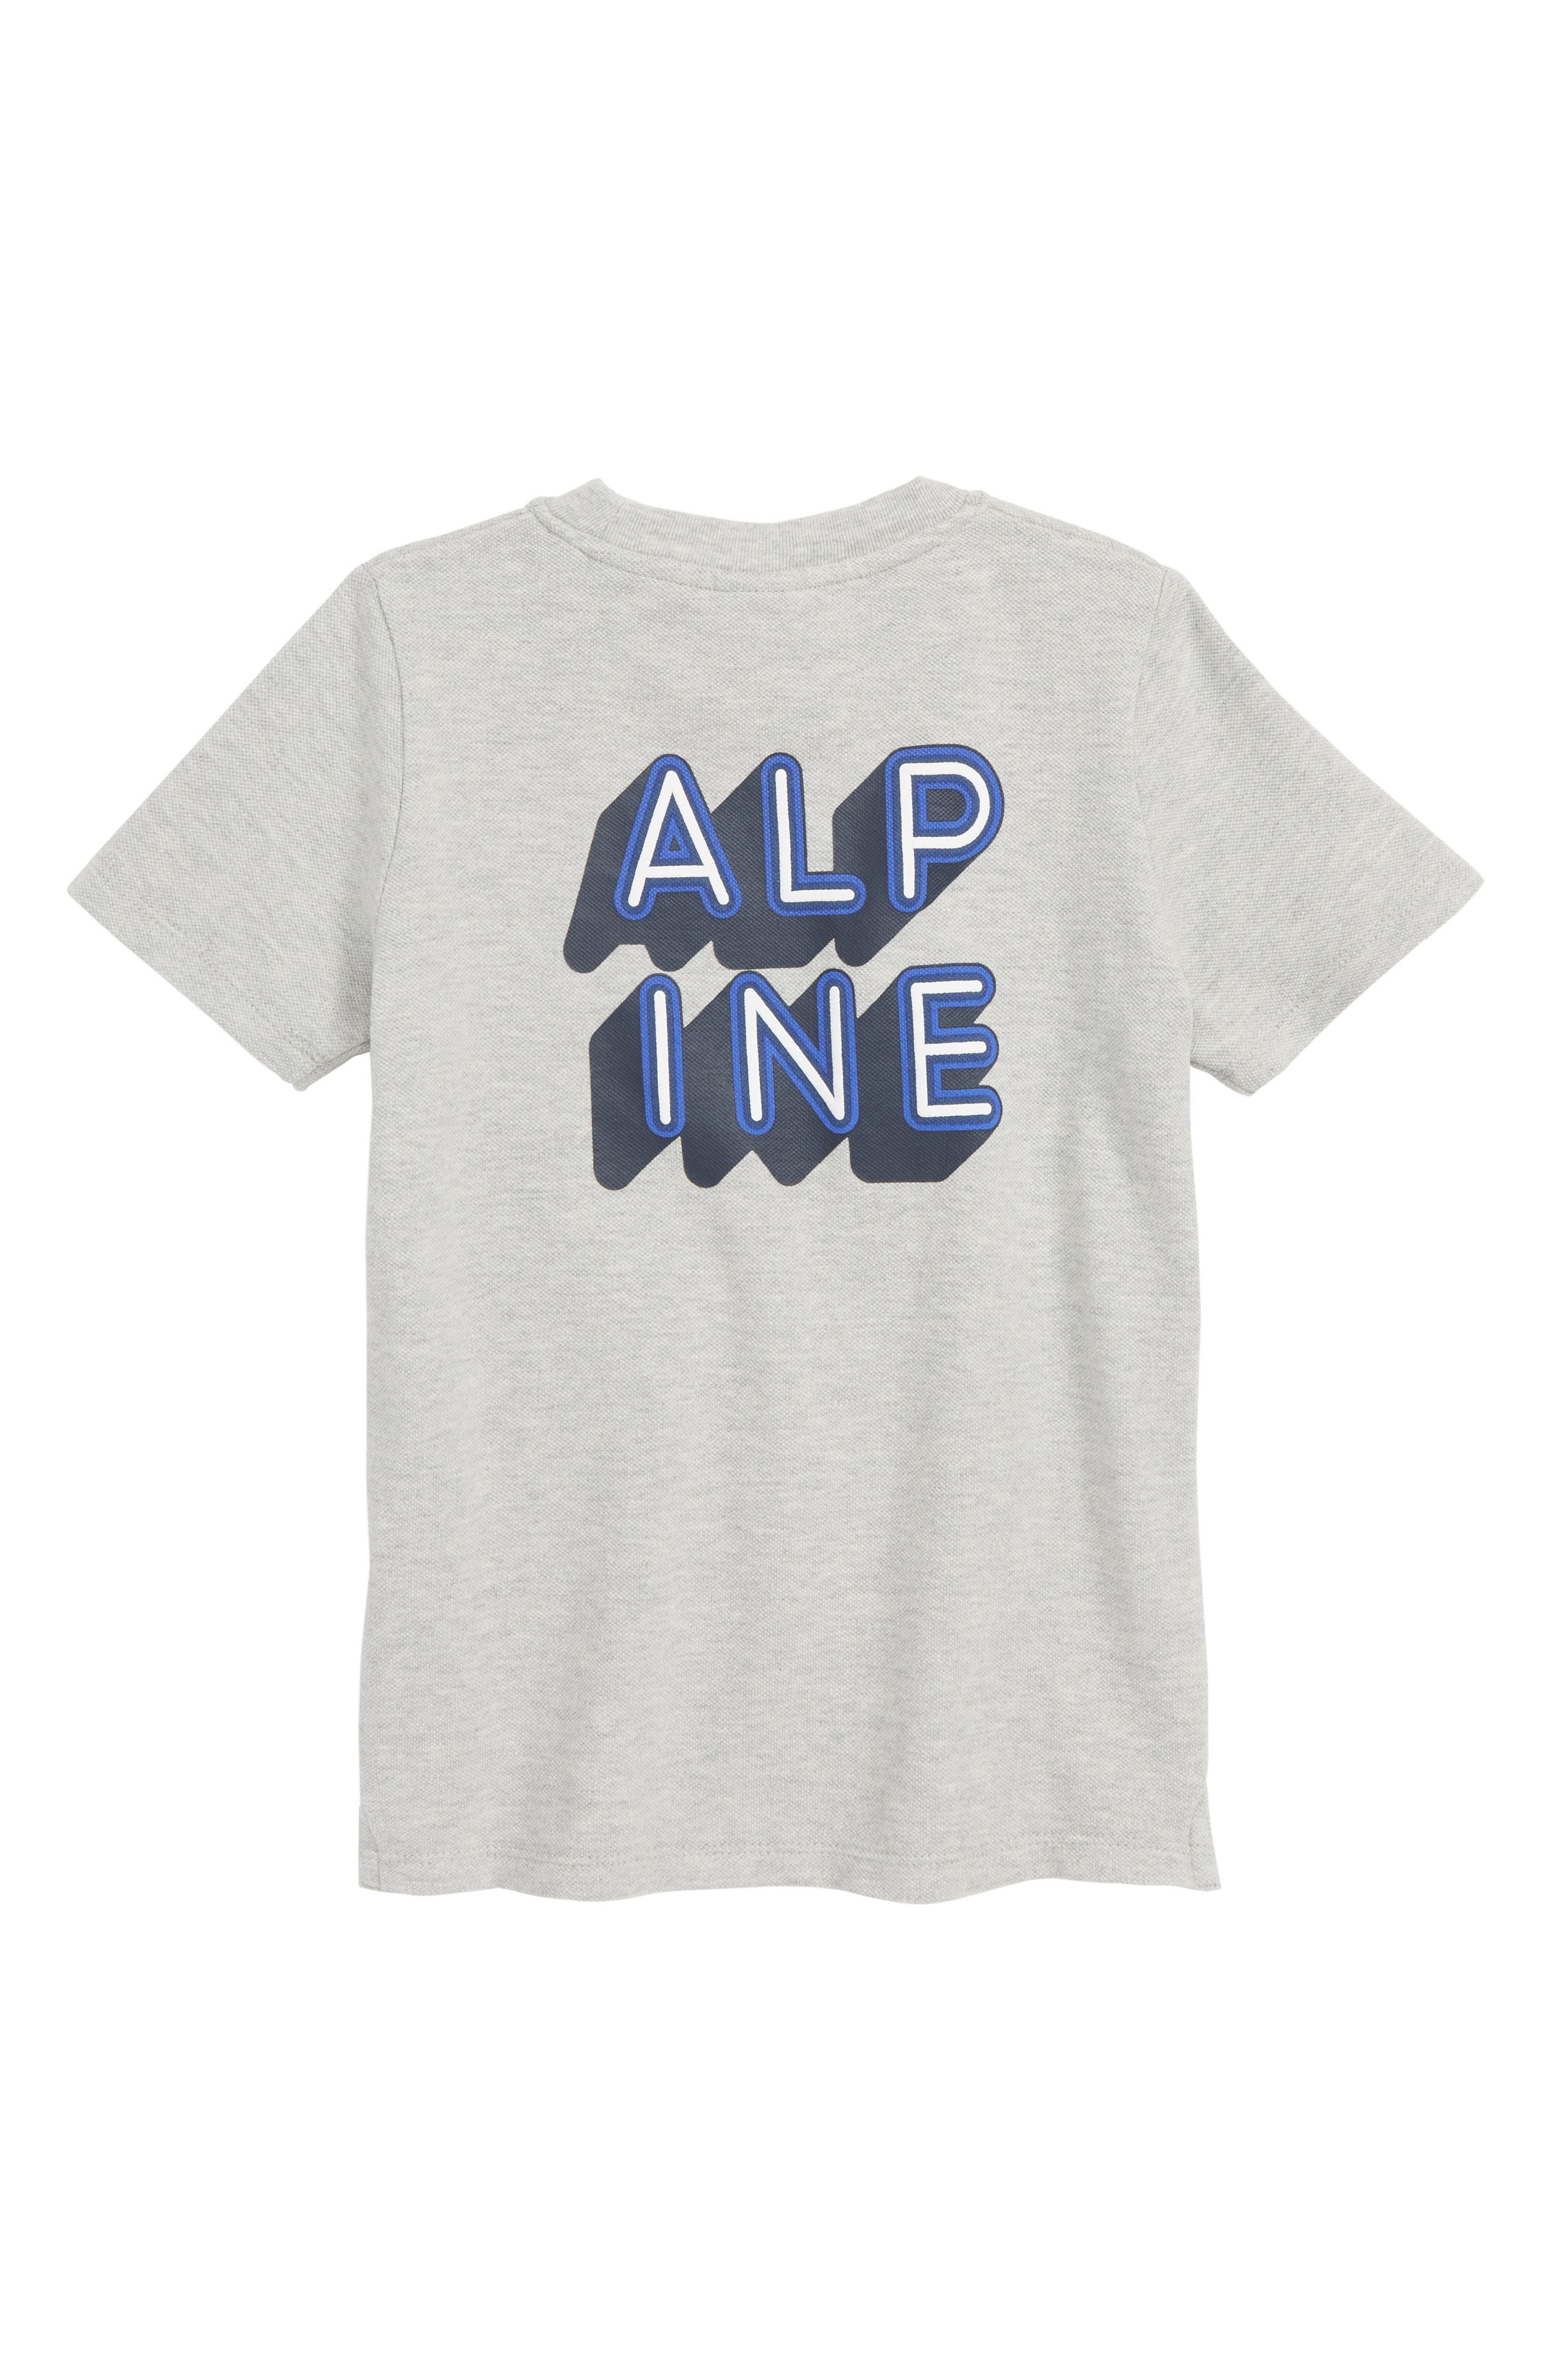 Alpine T-Shirt,                             Alternate thumbnail 2, color,                             GREY